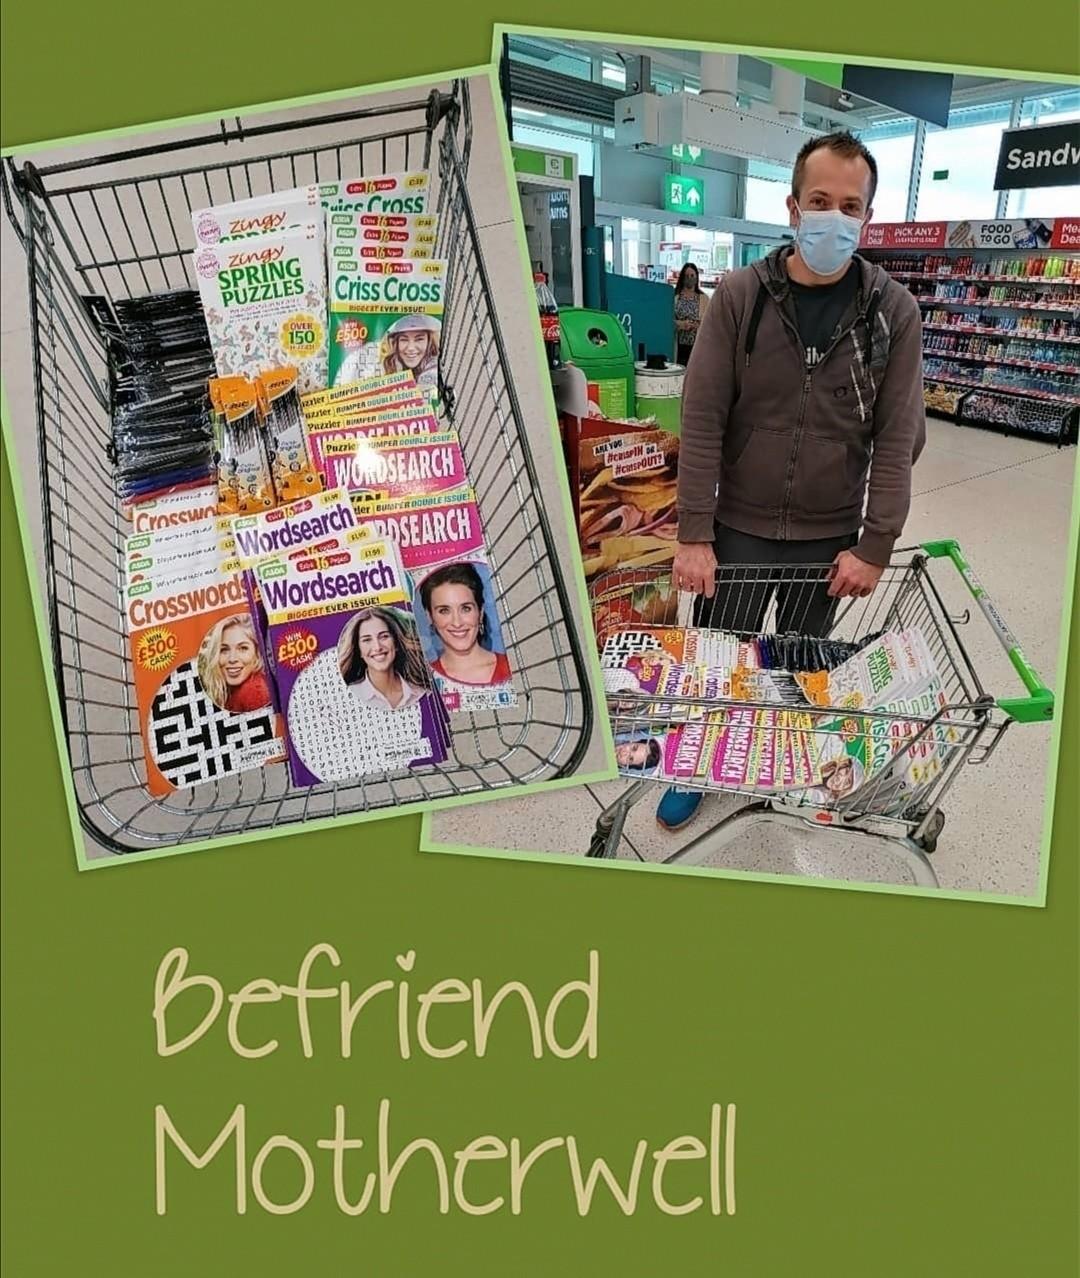 Befriend Motherwell Donation | Asda Motherwell